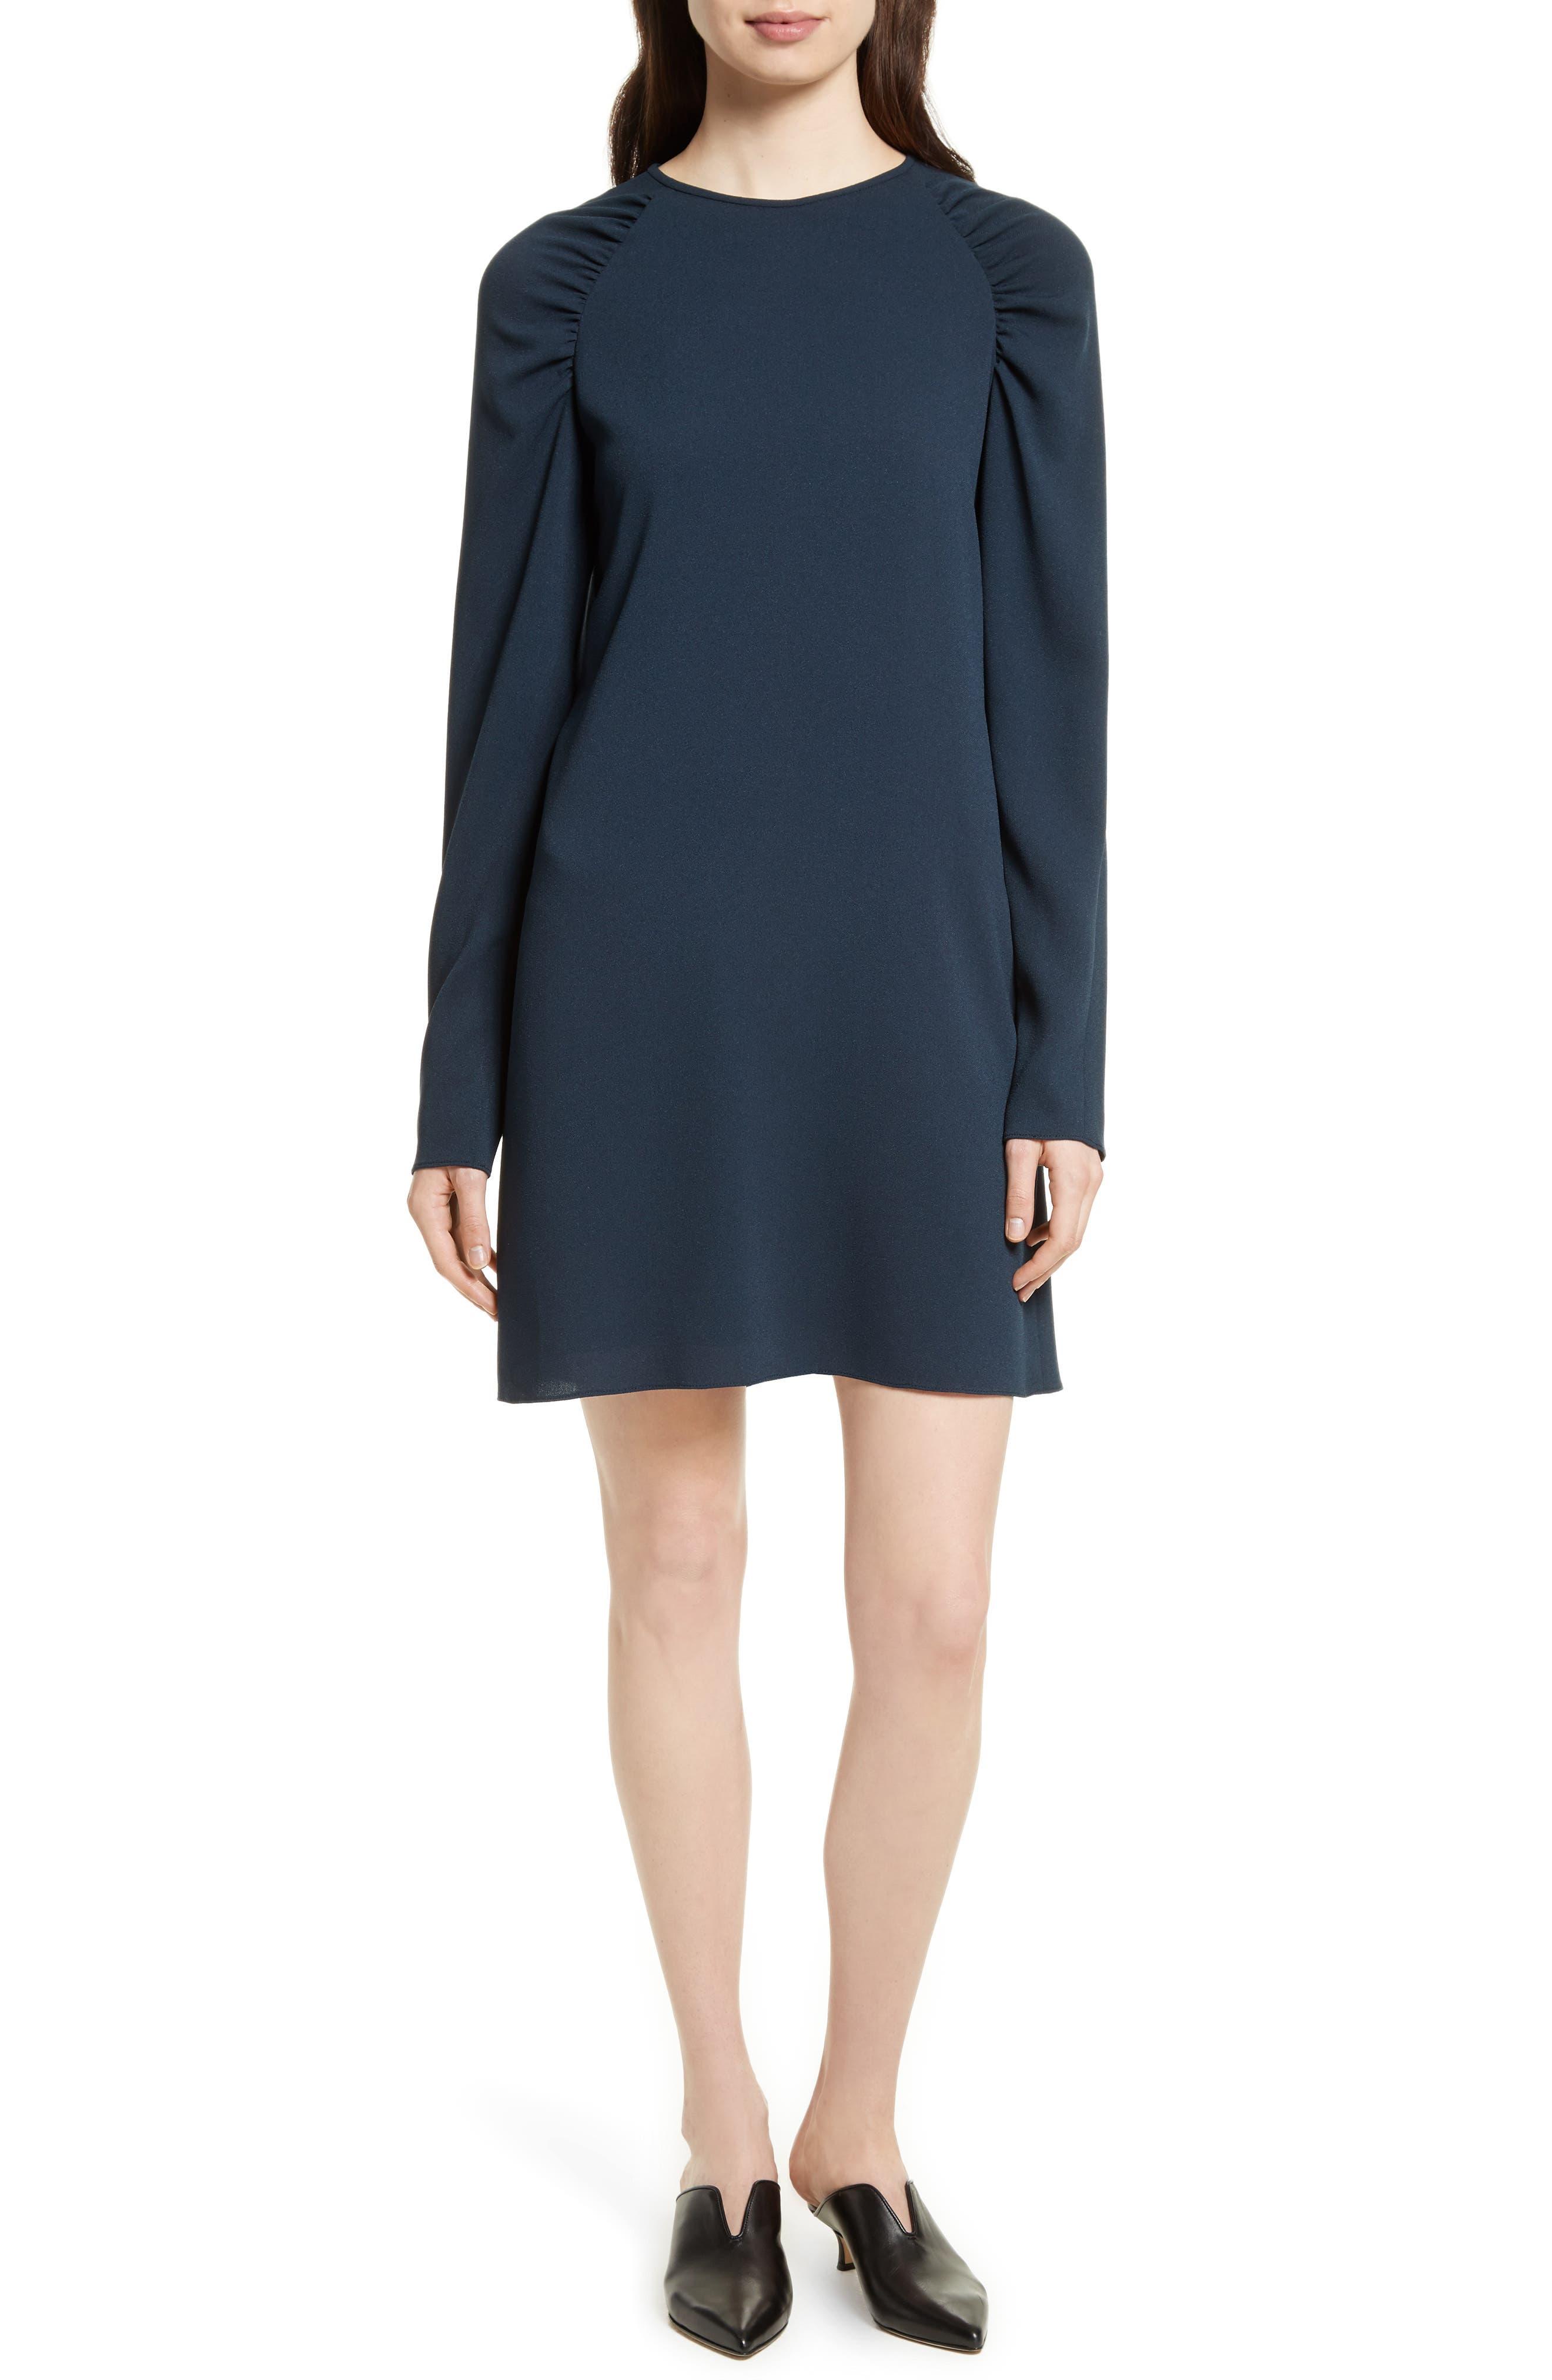 Alternate Image 1 Selected - Tibi Sav Crepe Shift Dress